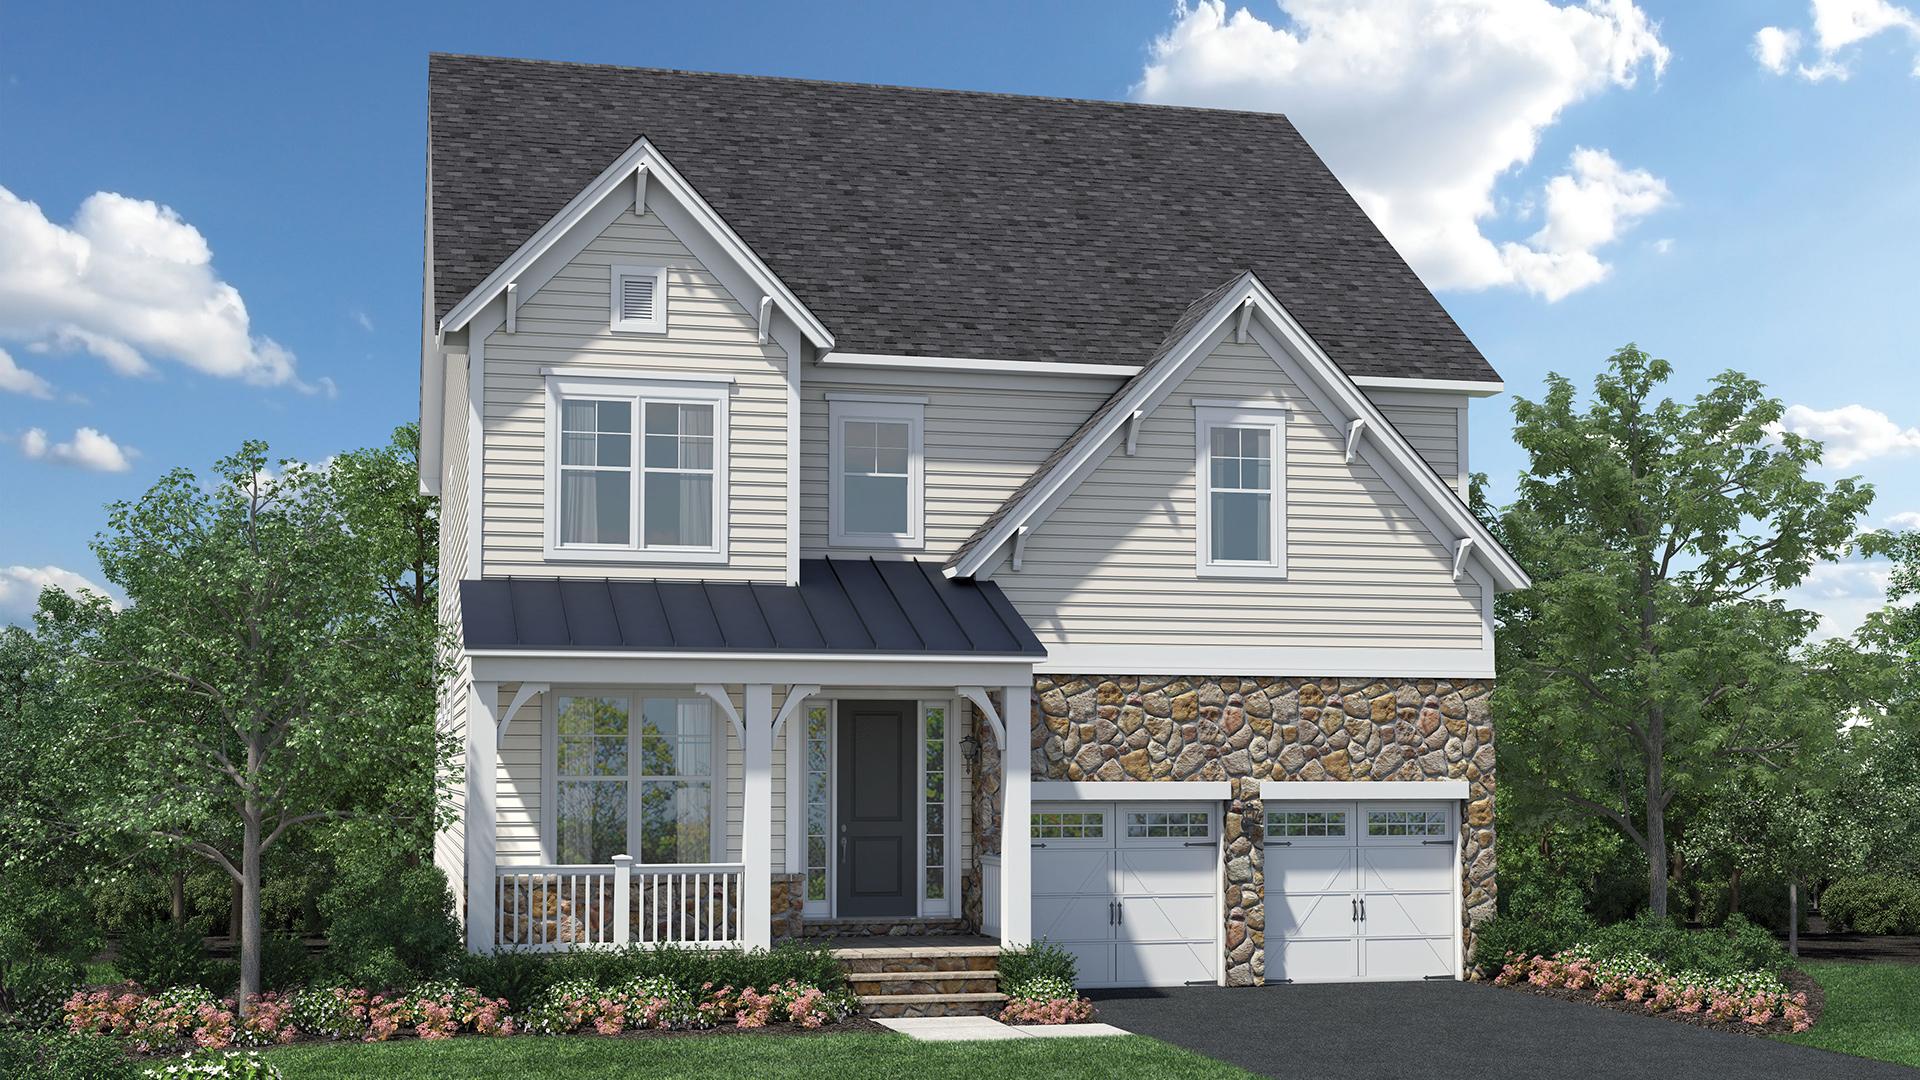 Dominion Valley Country Club Carolinas The Fincastle Home Design